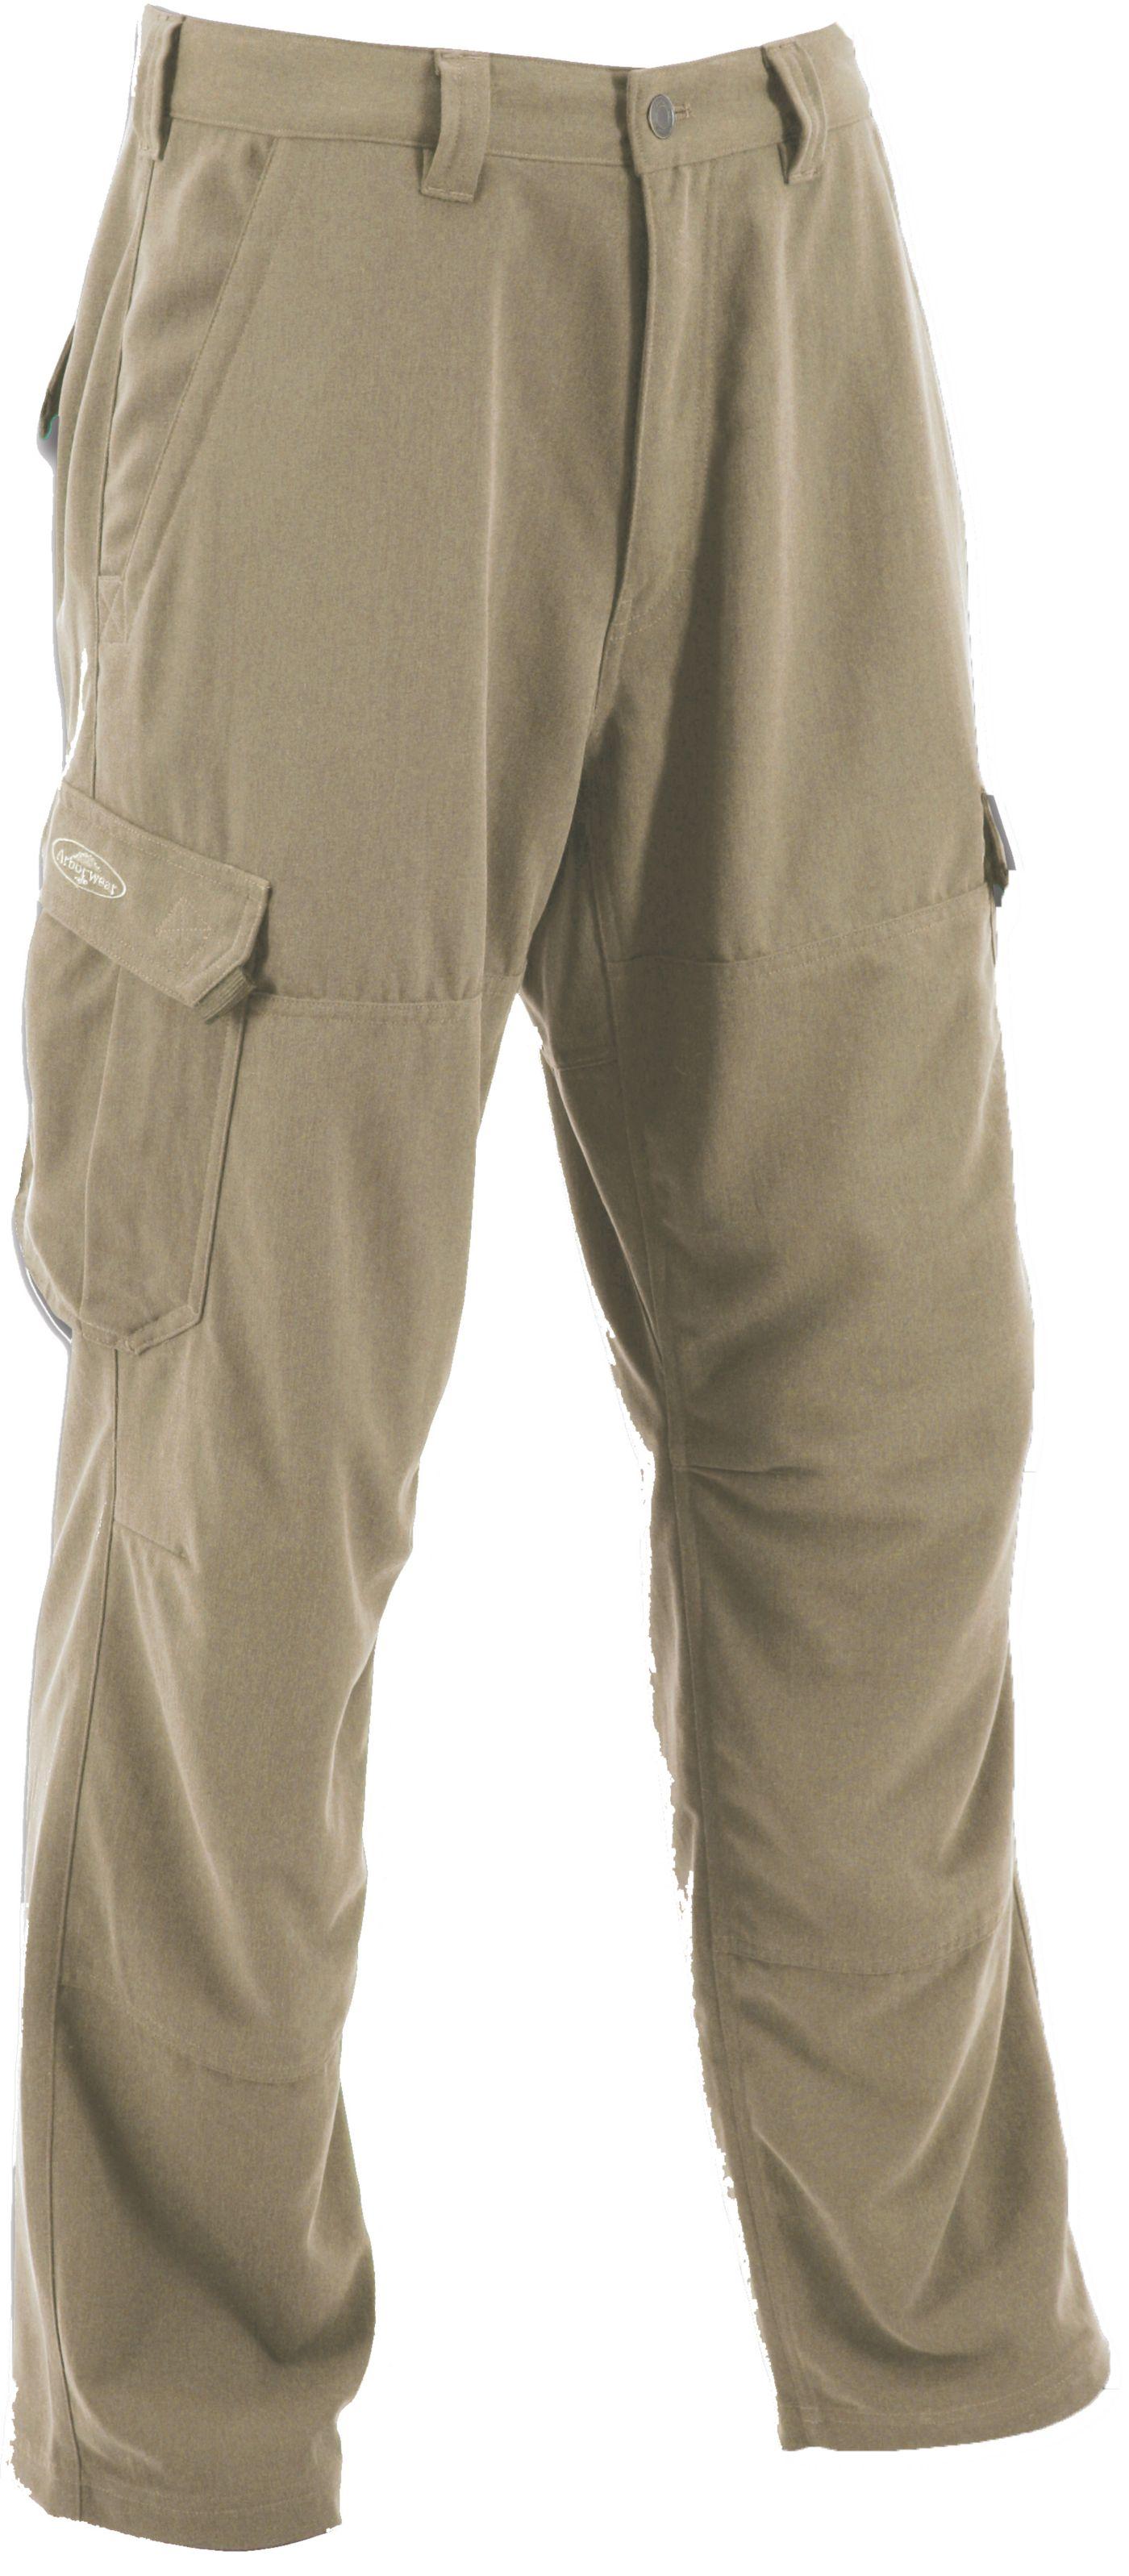 Arborwear Men's Tech II Pants